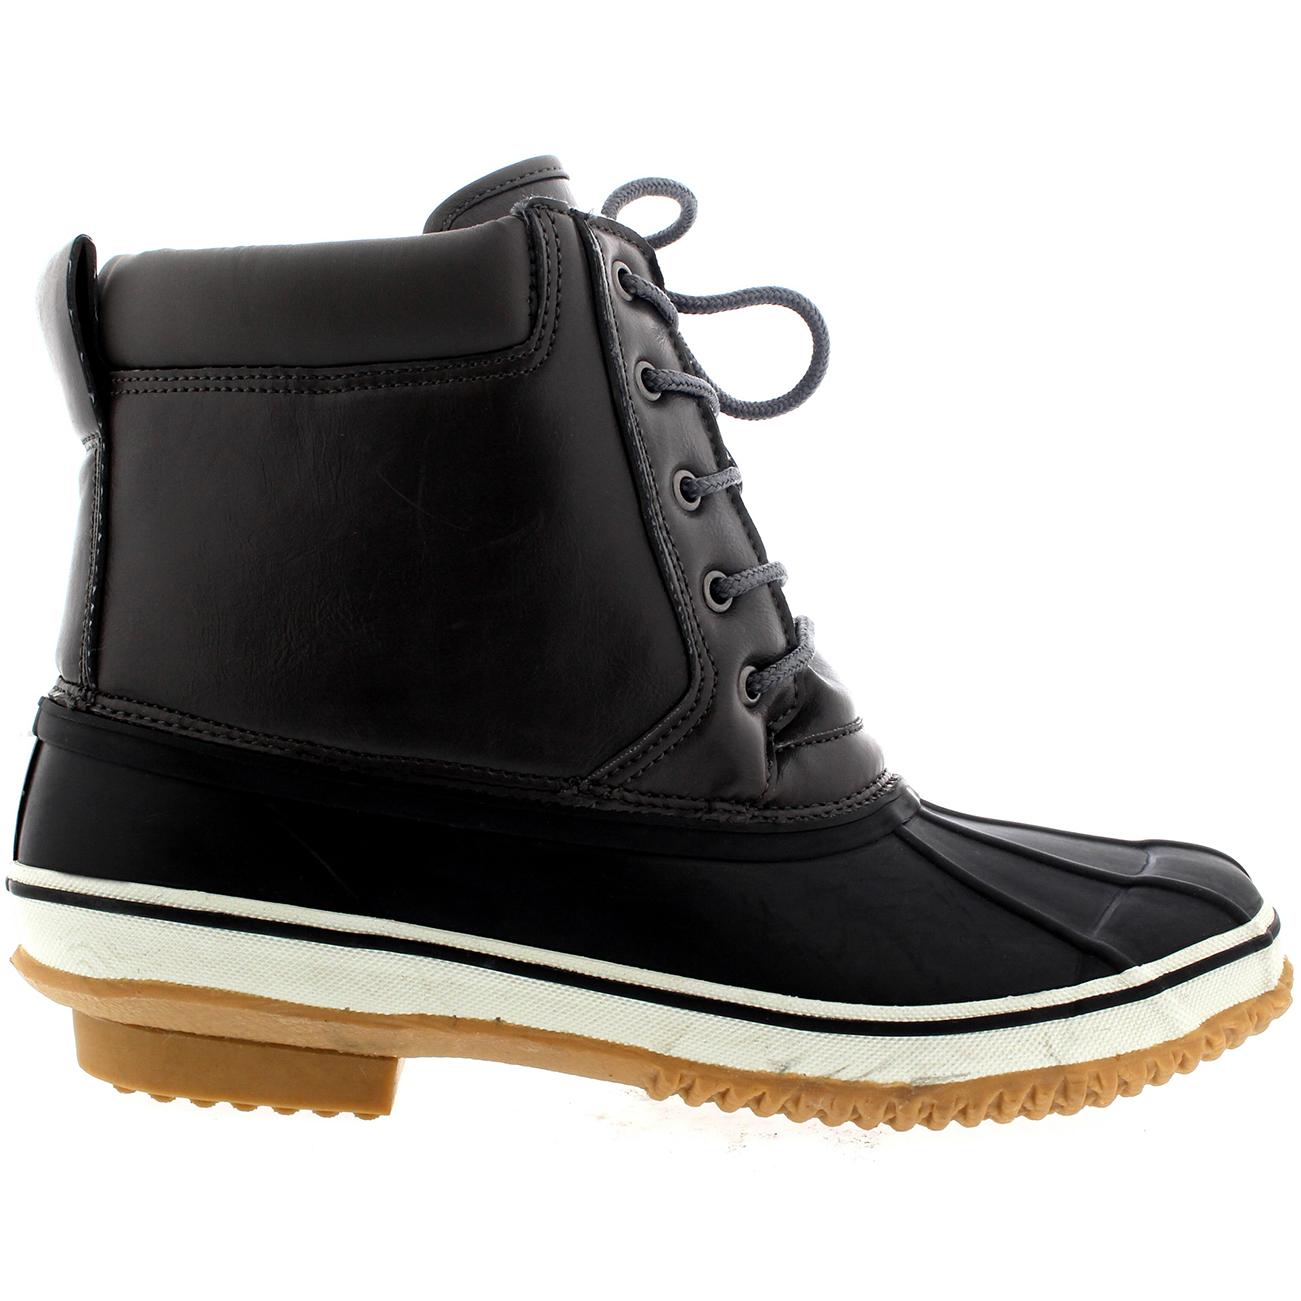 Nike Slip Resistant Shoes Mens Images On